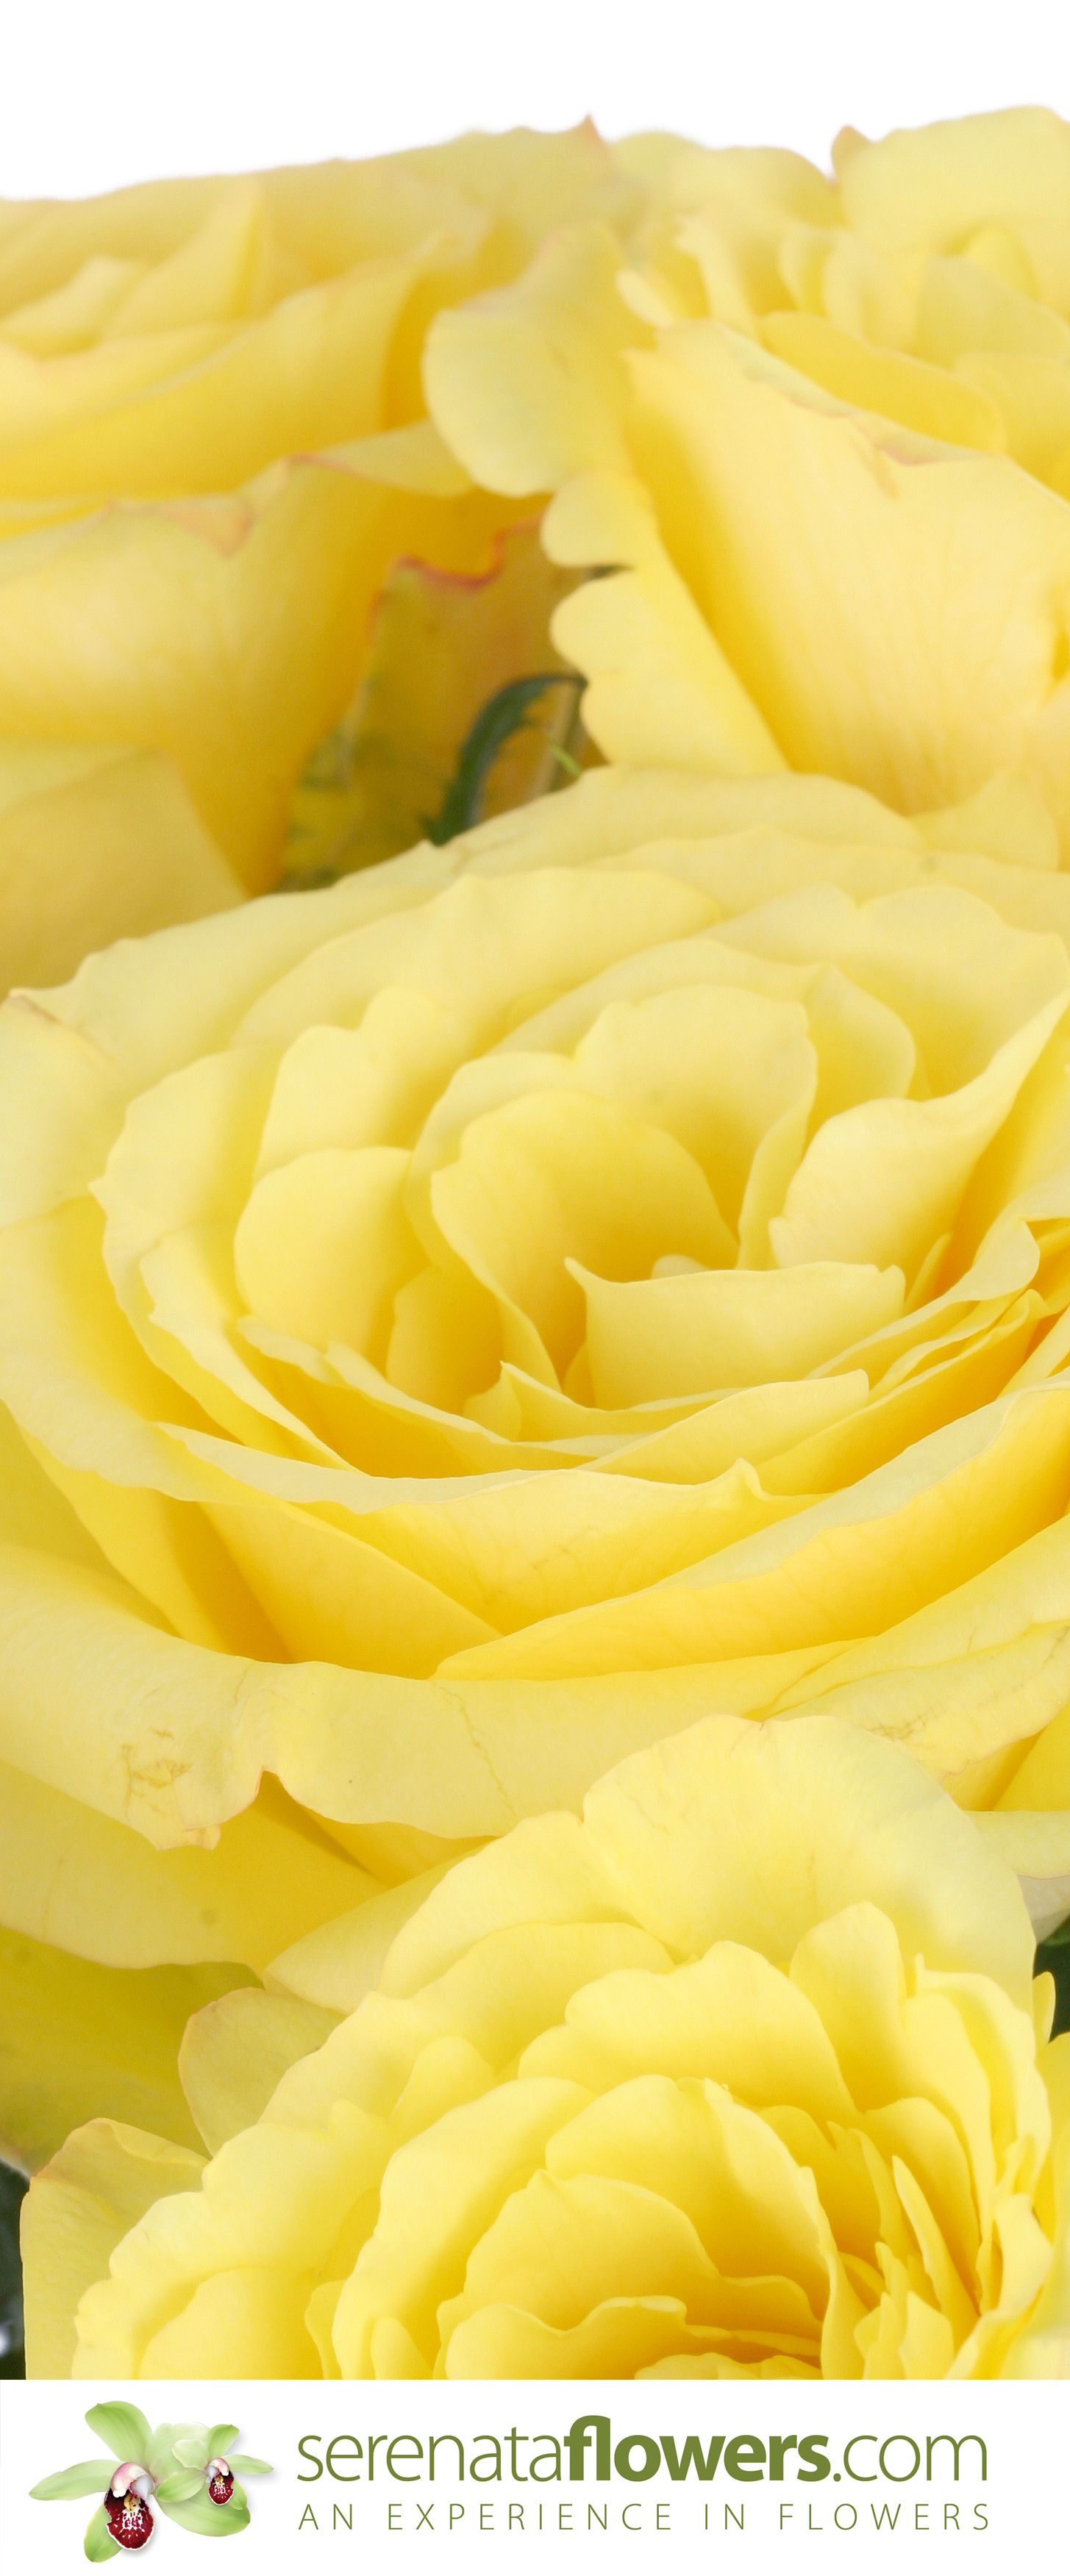 #yellow #roses from #serenata #flowers  #flowerbouquets #flowersdelivery #bouquets #yellowroses #rosebouquets